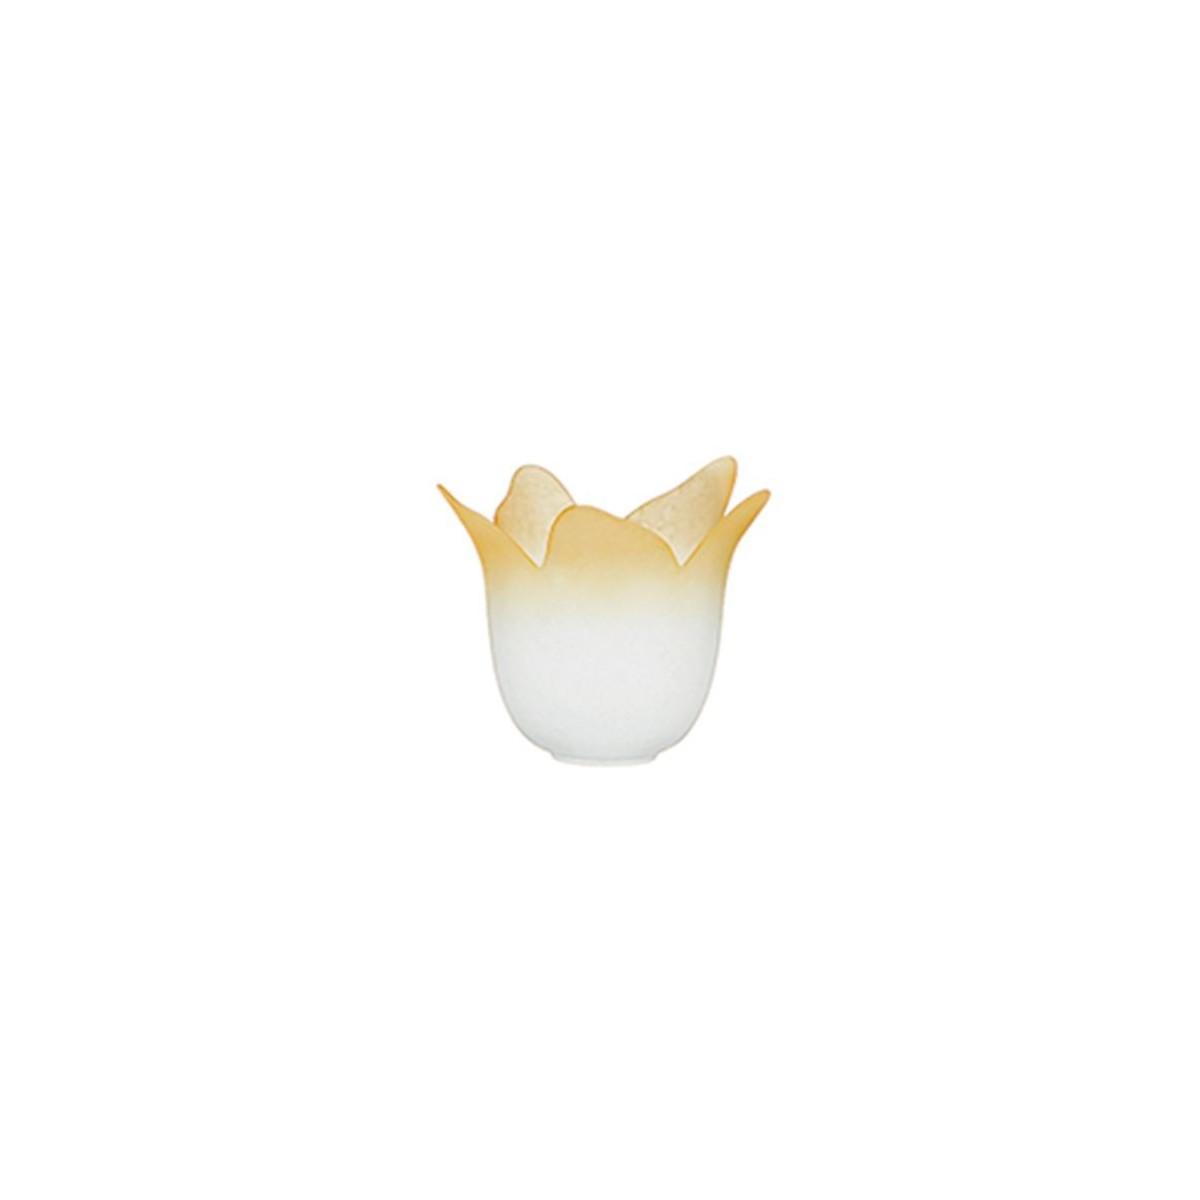 90191303201129 - Paralume Floreale Vetro Bianco Bordo Ambra F30